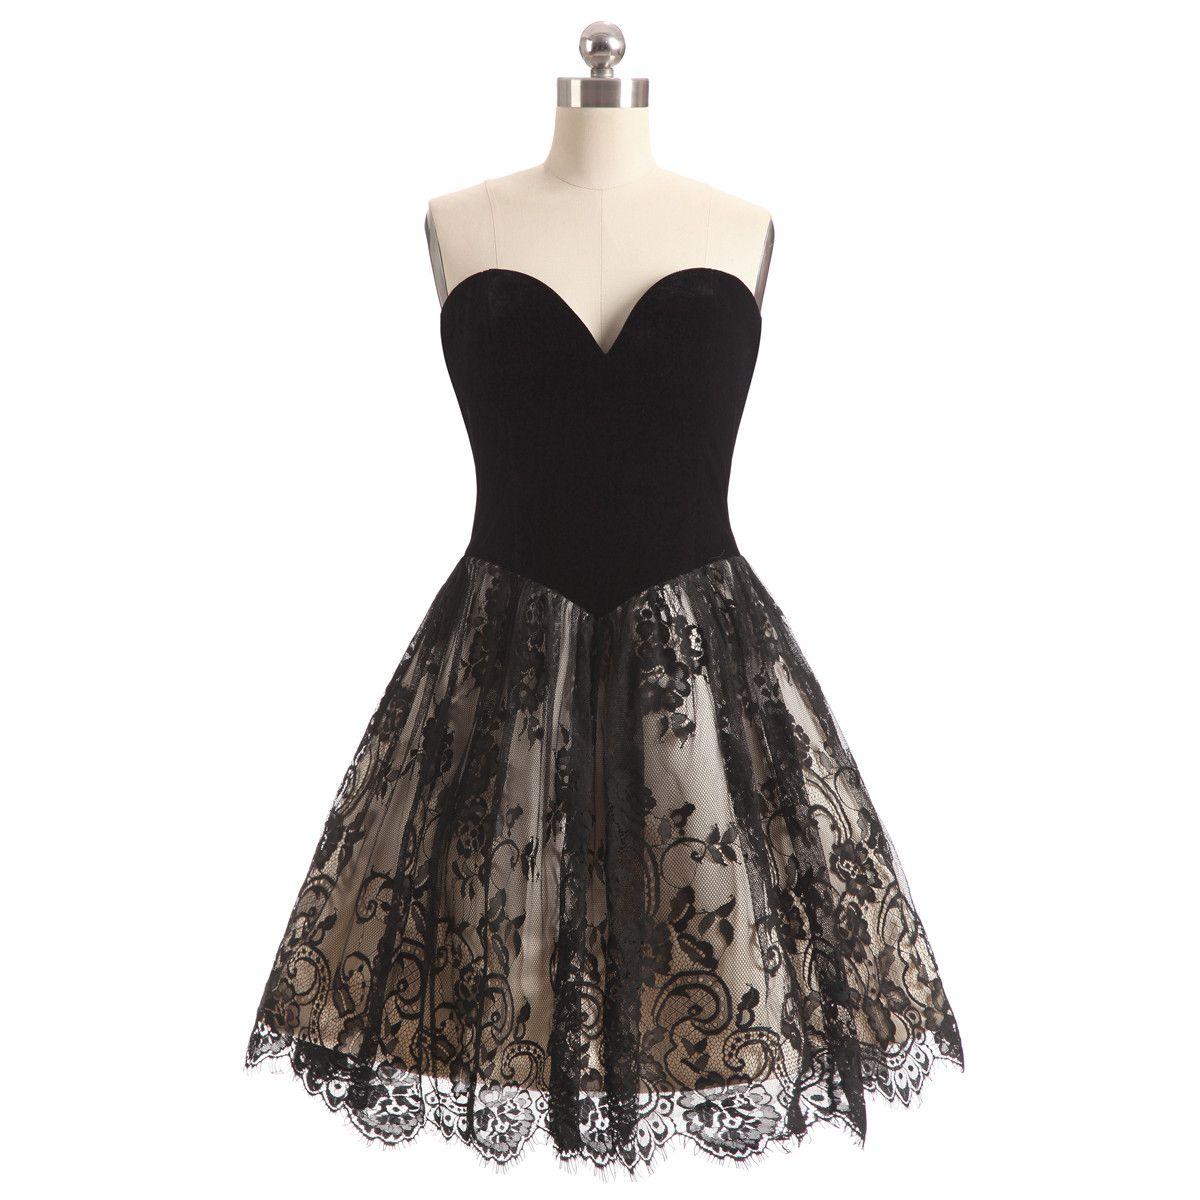 Sweetheart Evening Dresses Robe De Soiree Sweet 16 Graduation Dress Short Prom Dress Cocktail Dress SH0122